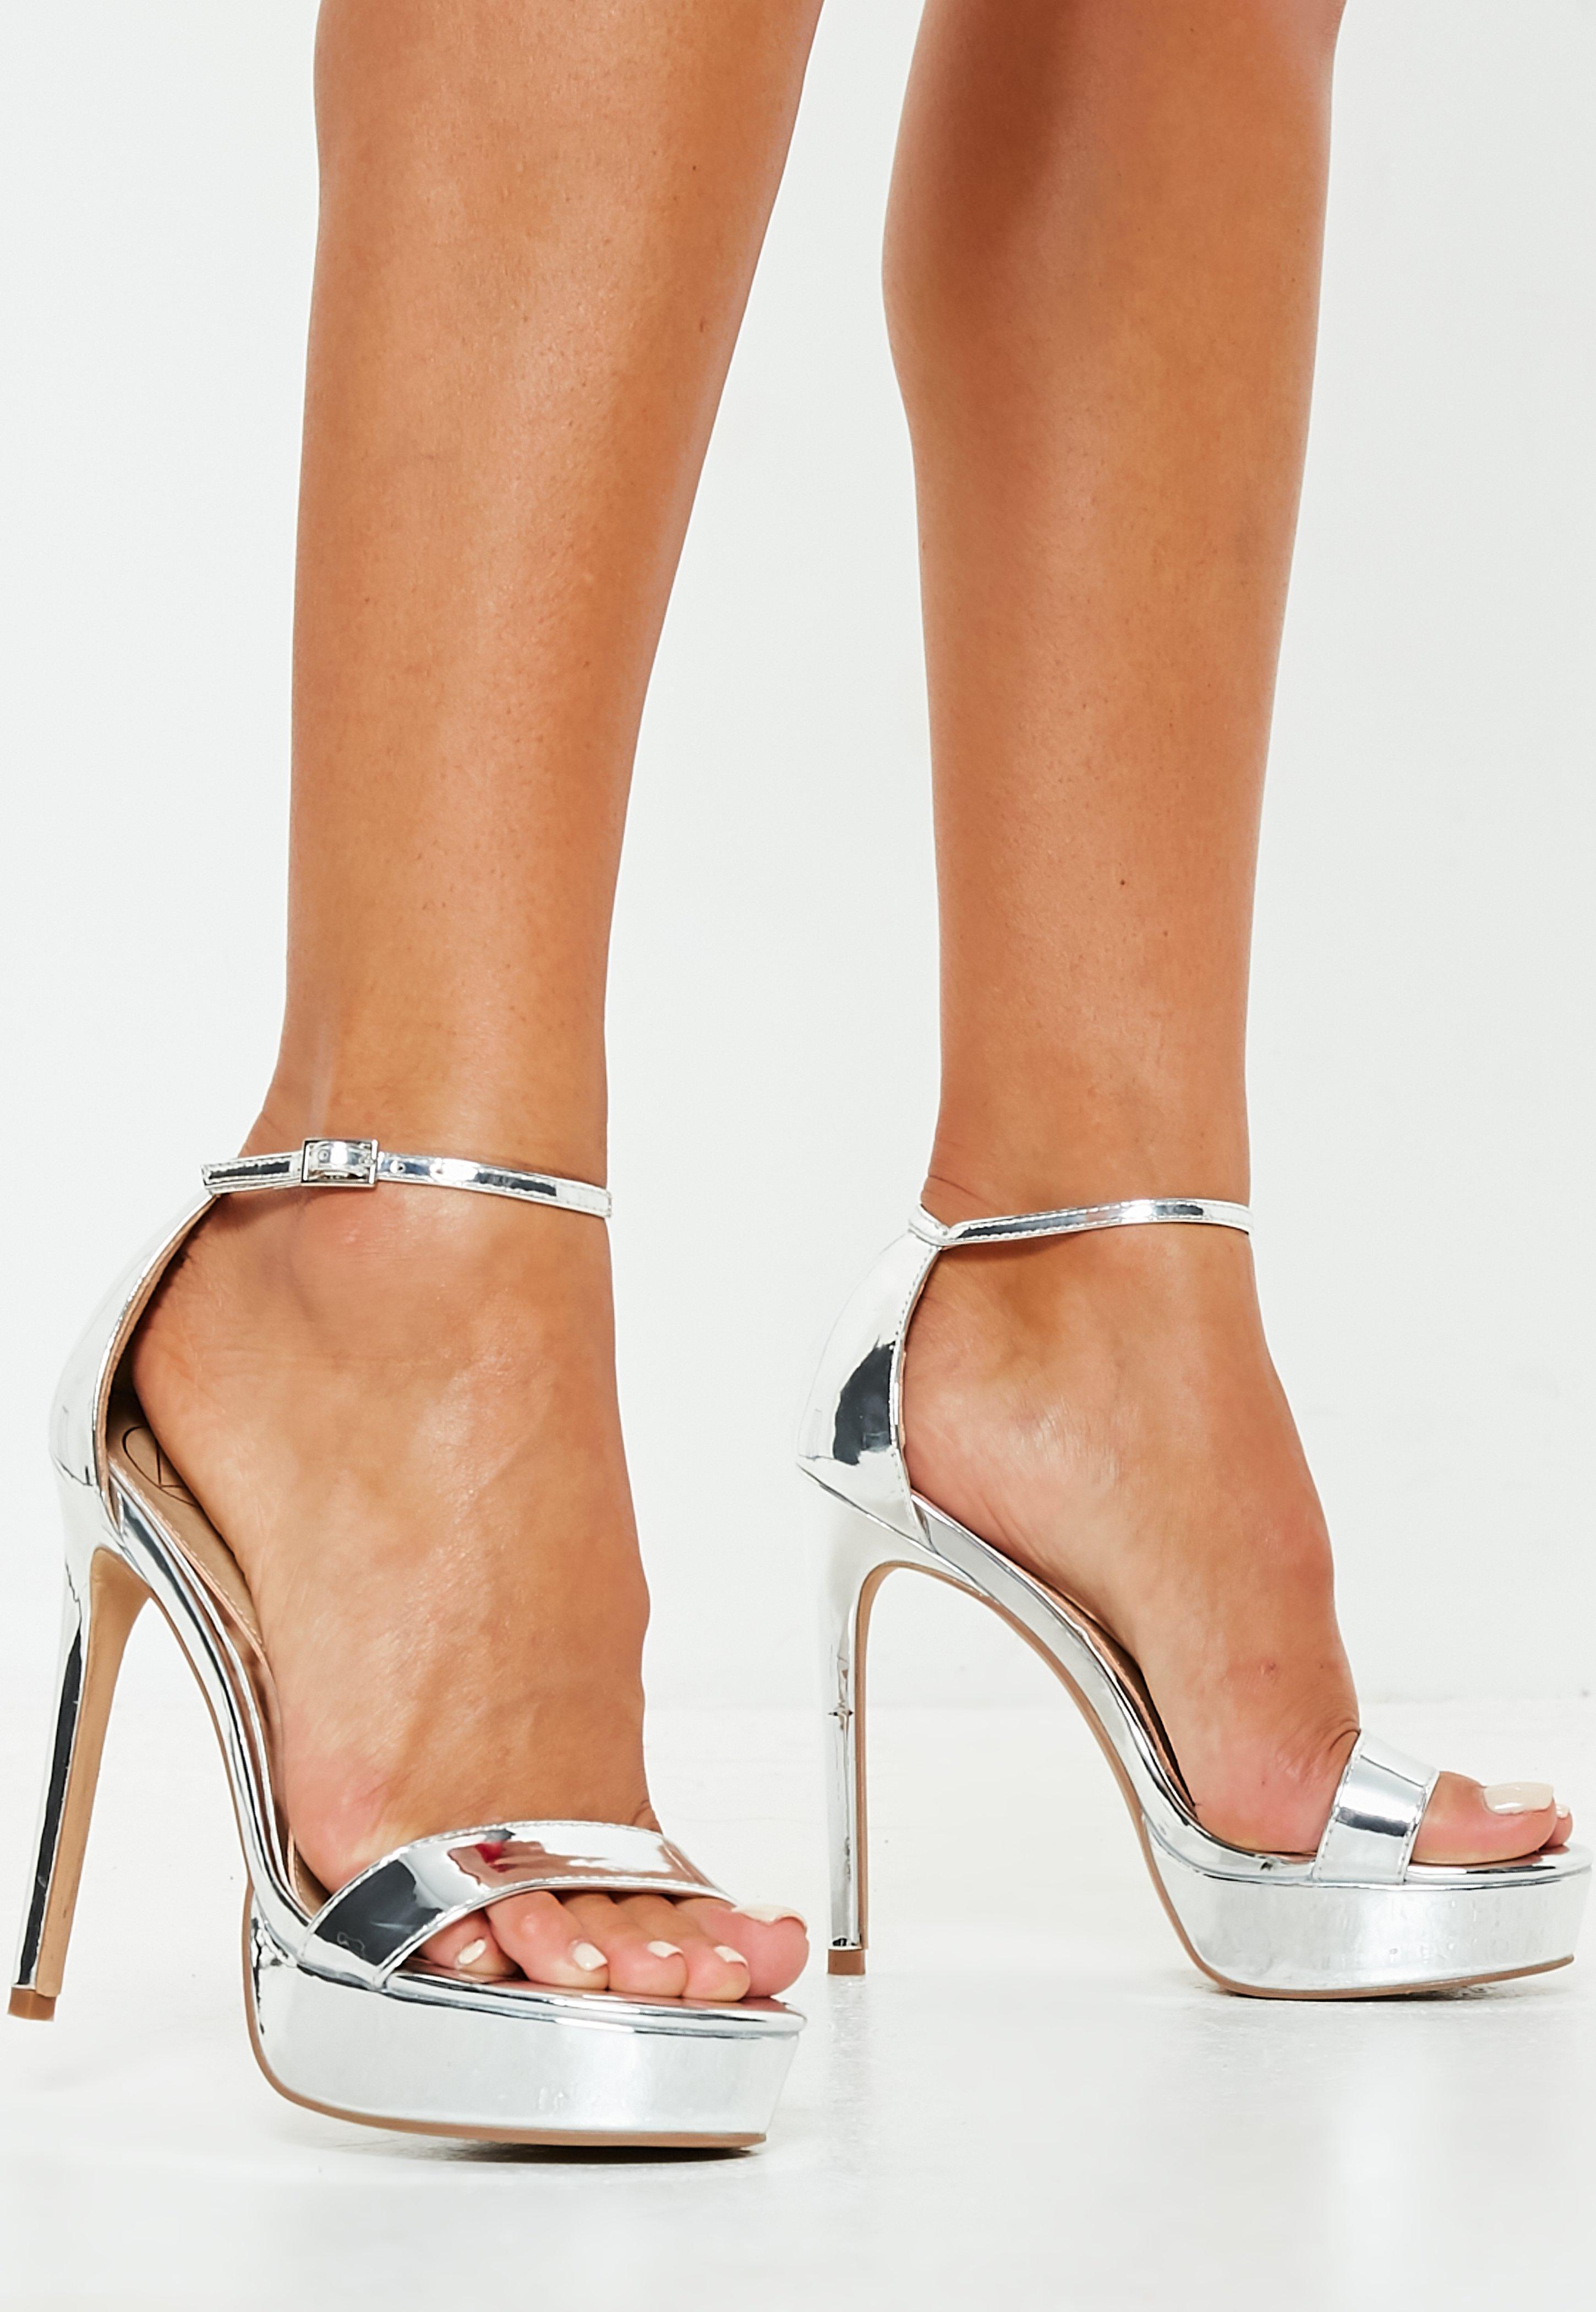 0f2efb3577c866 Lyst - Missguided Silver Simple Strap Platform Sandals in Metallic